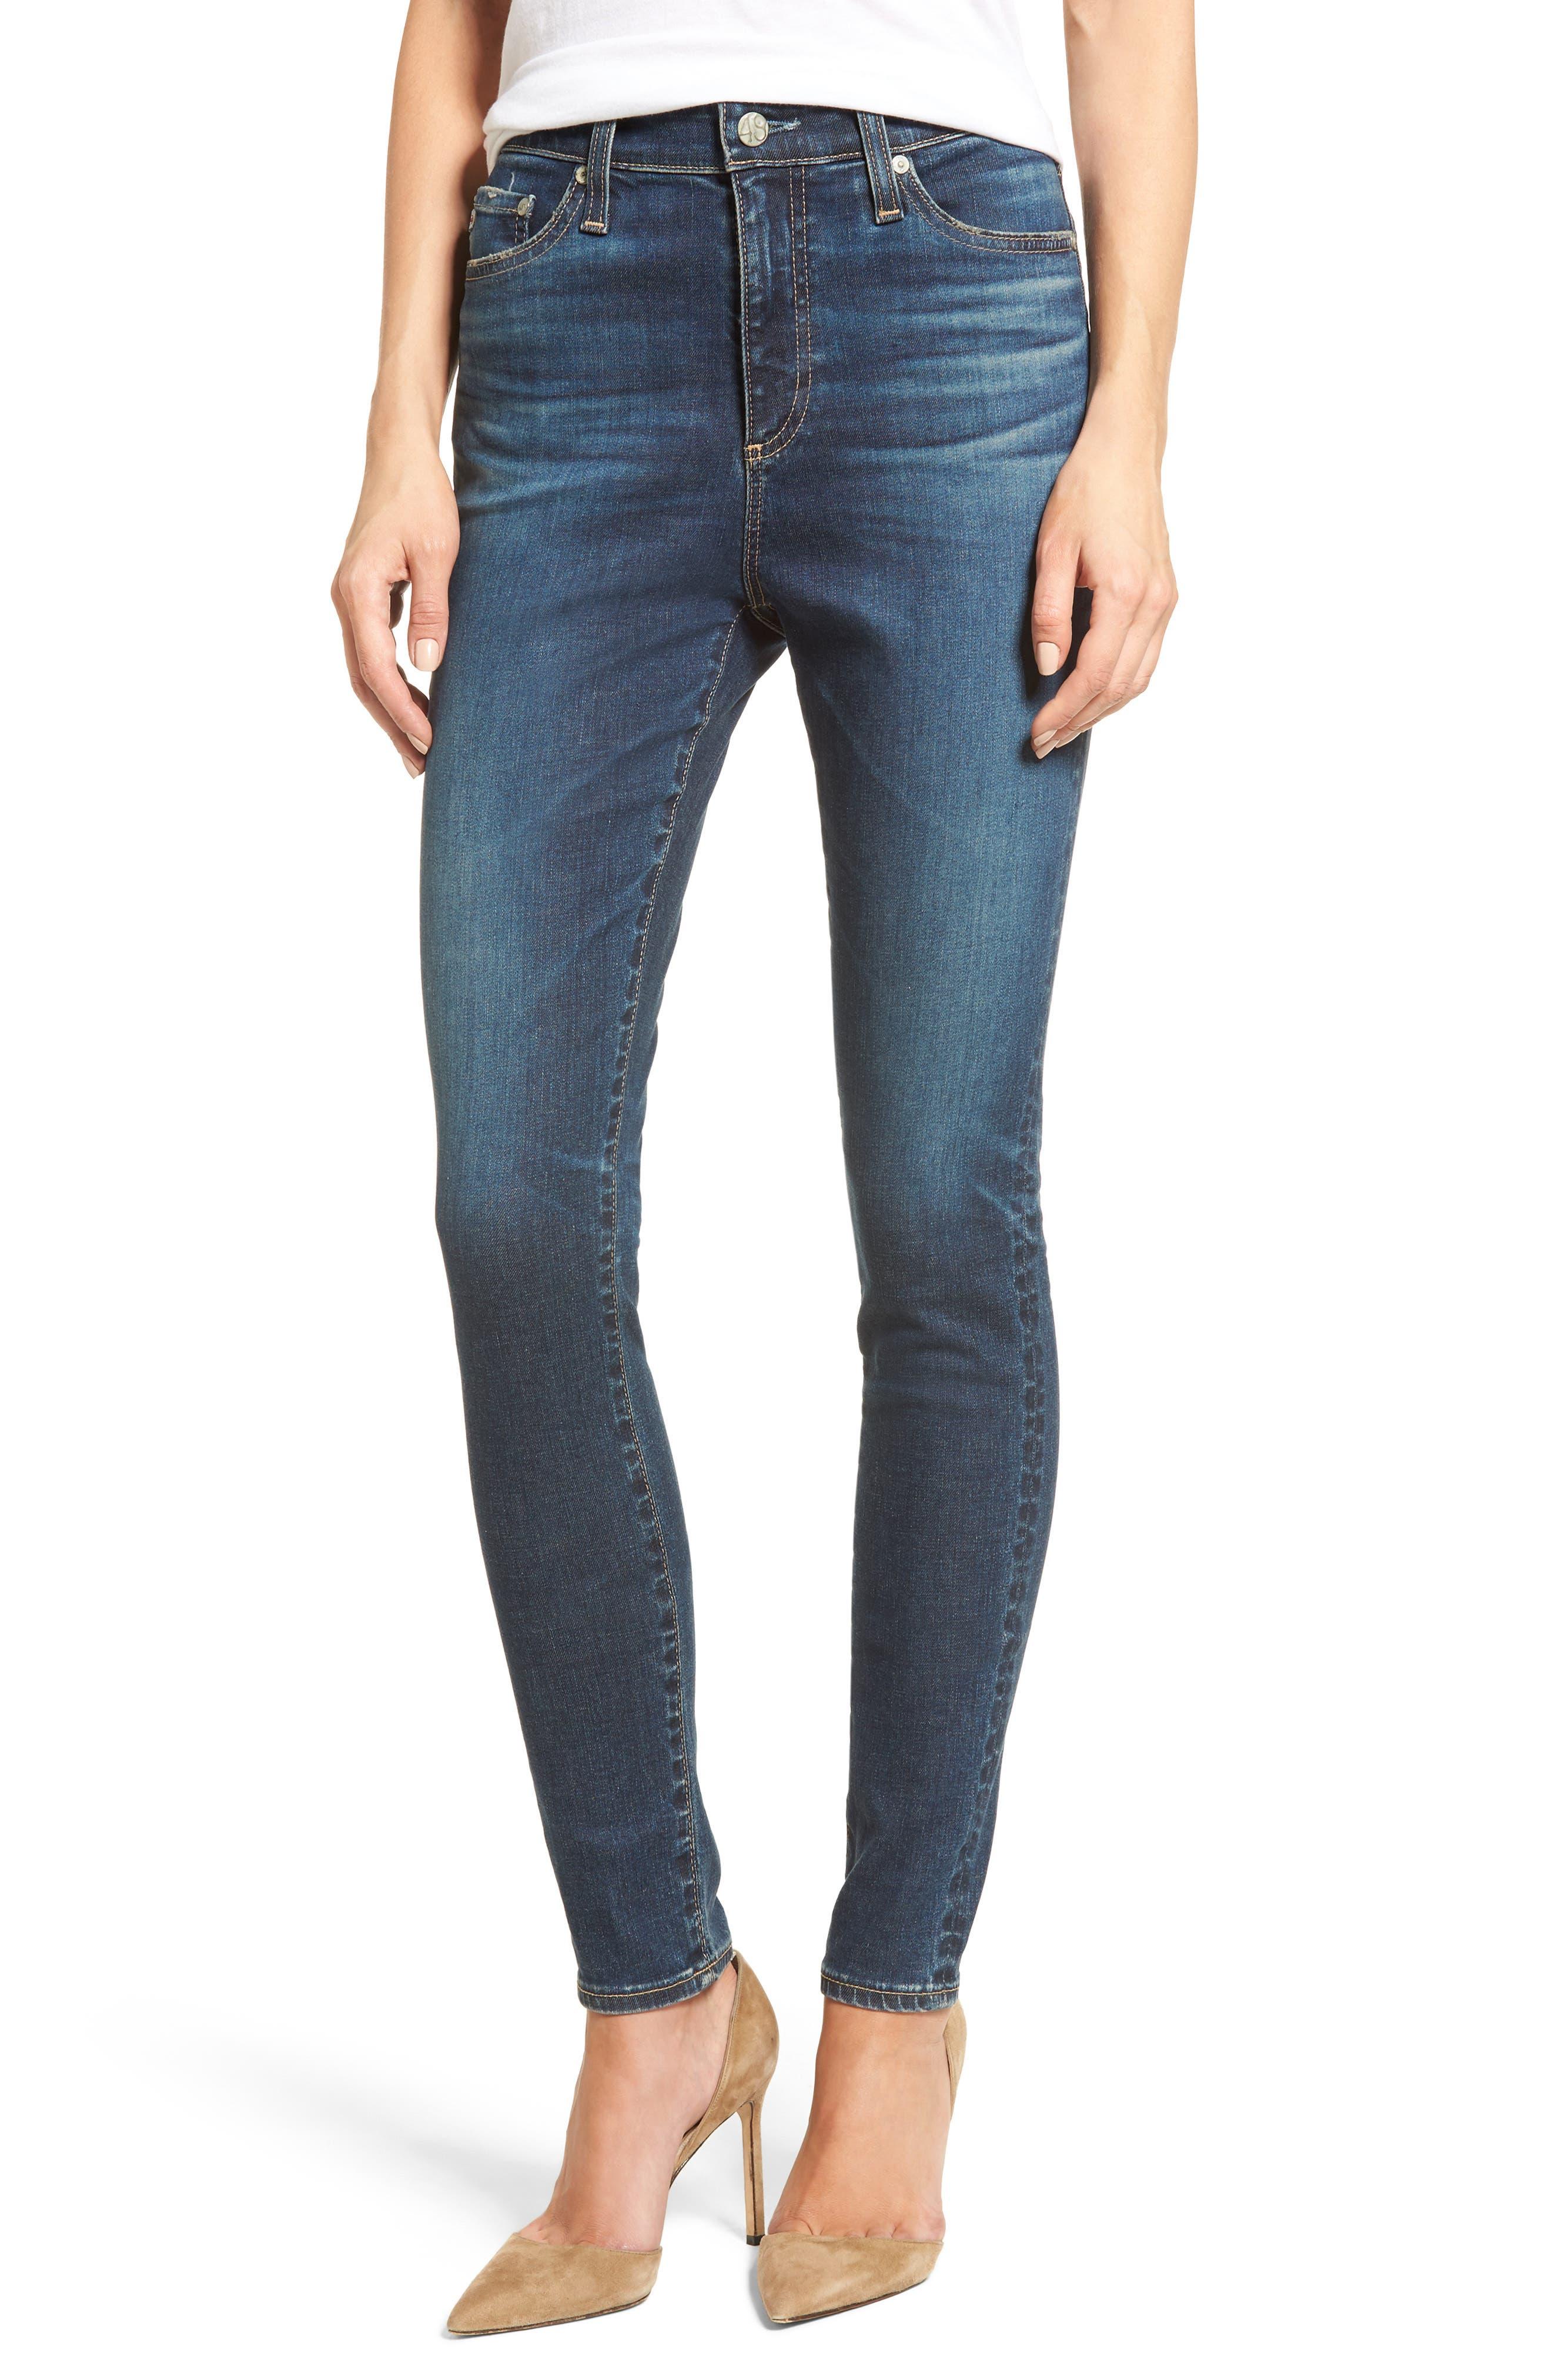 Alternate Image 1 Selected - AG Mila High Rise Skinny Jeans (06 Years Songbird)